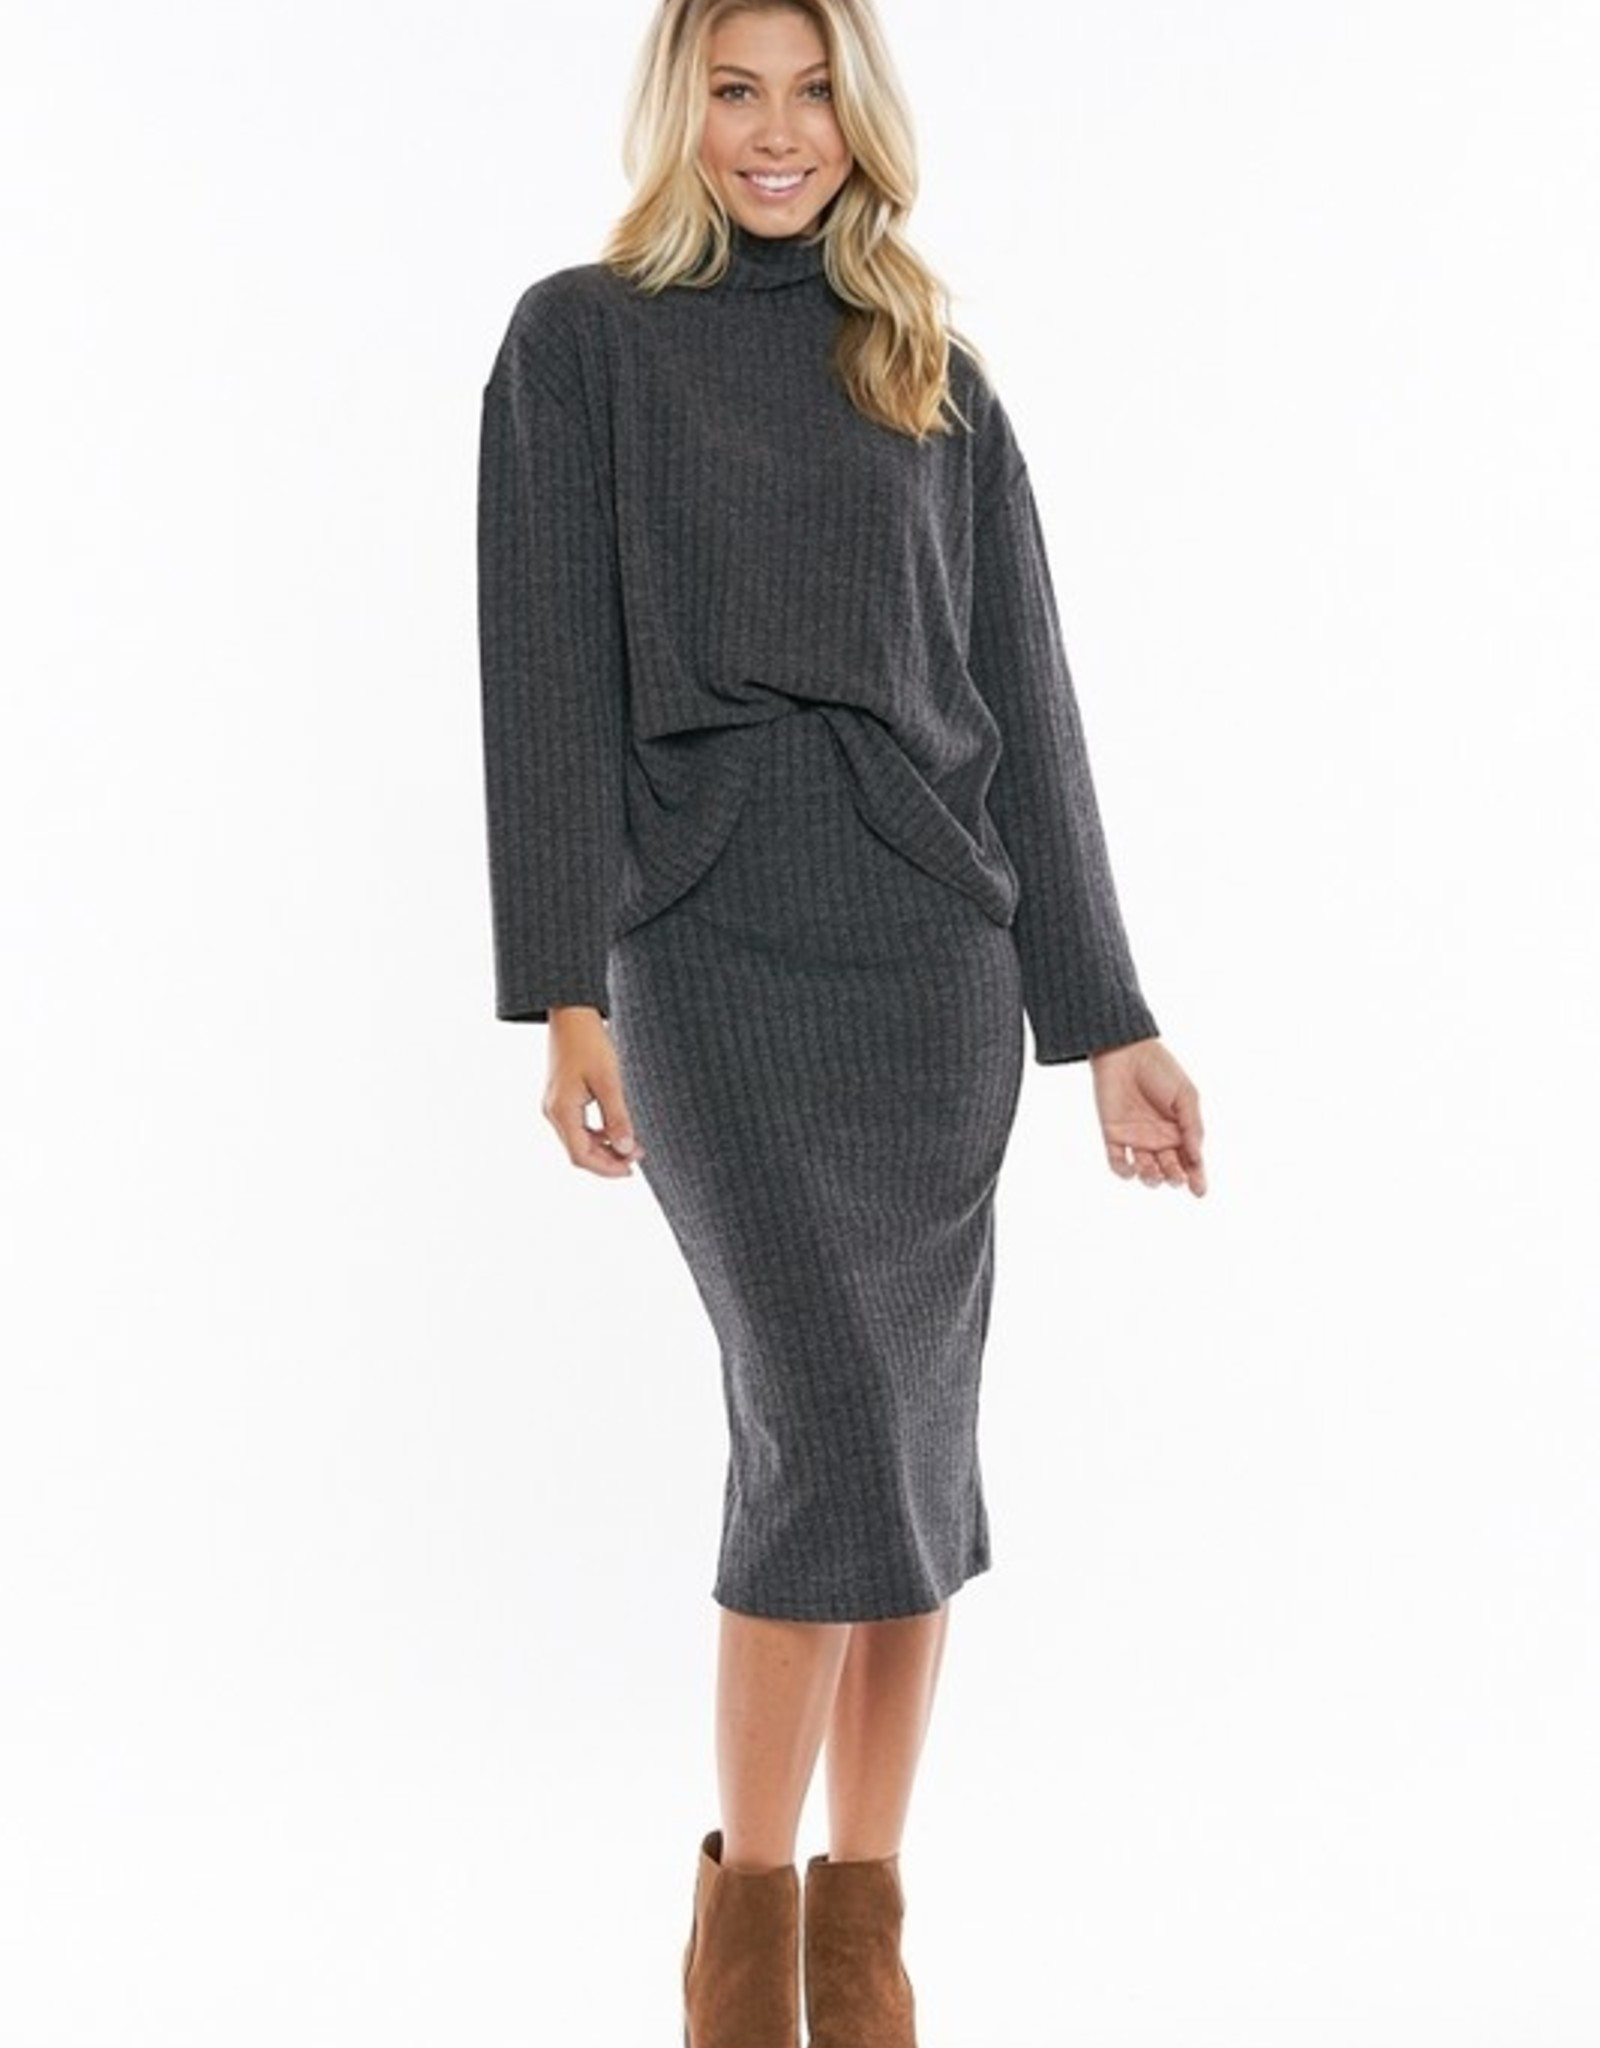 Turtel neck sweater